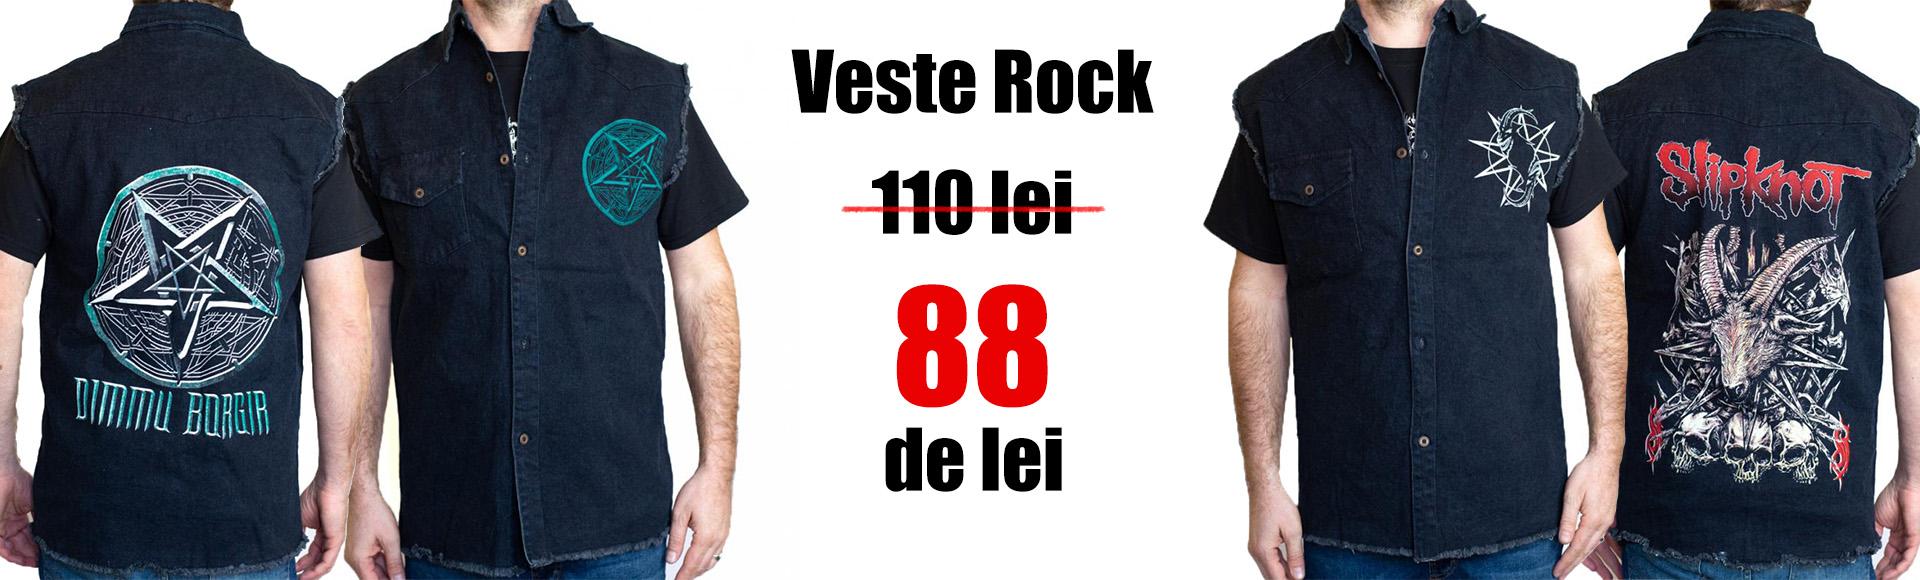 Veste Rock